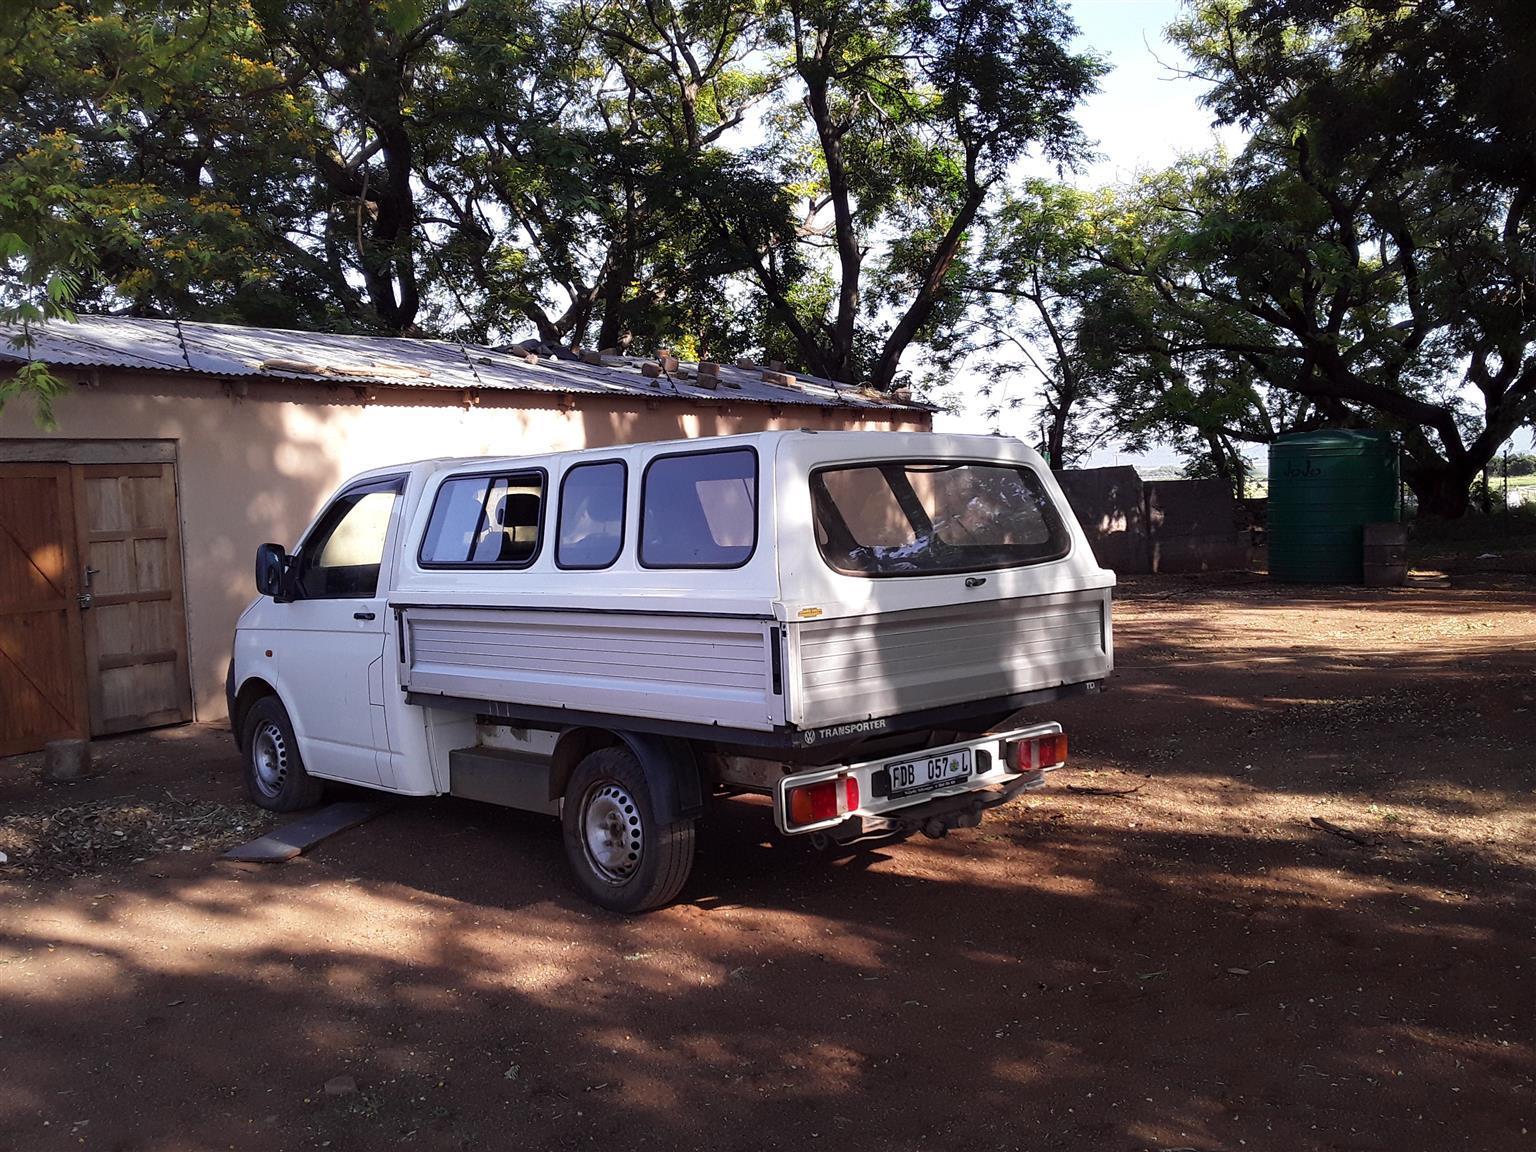 Vw transporter canopy for sale